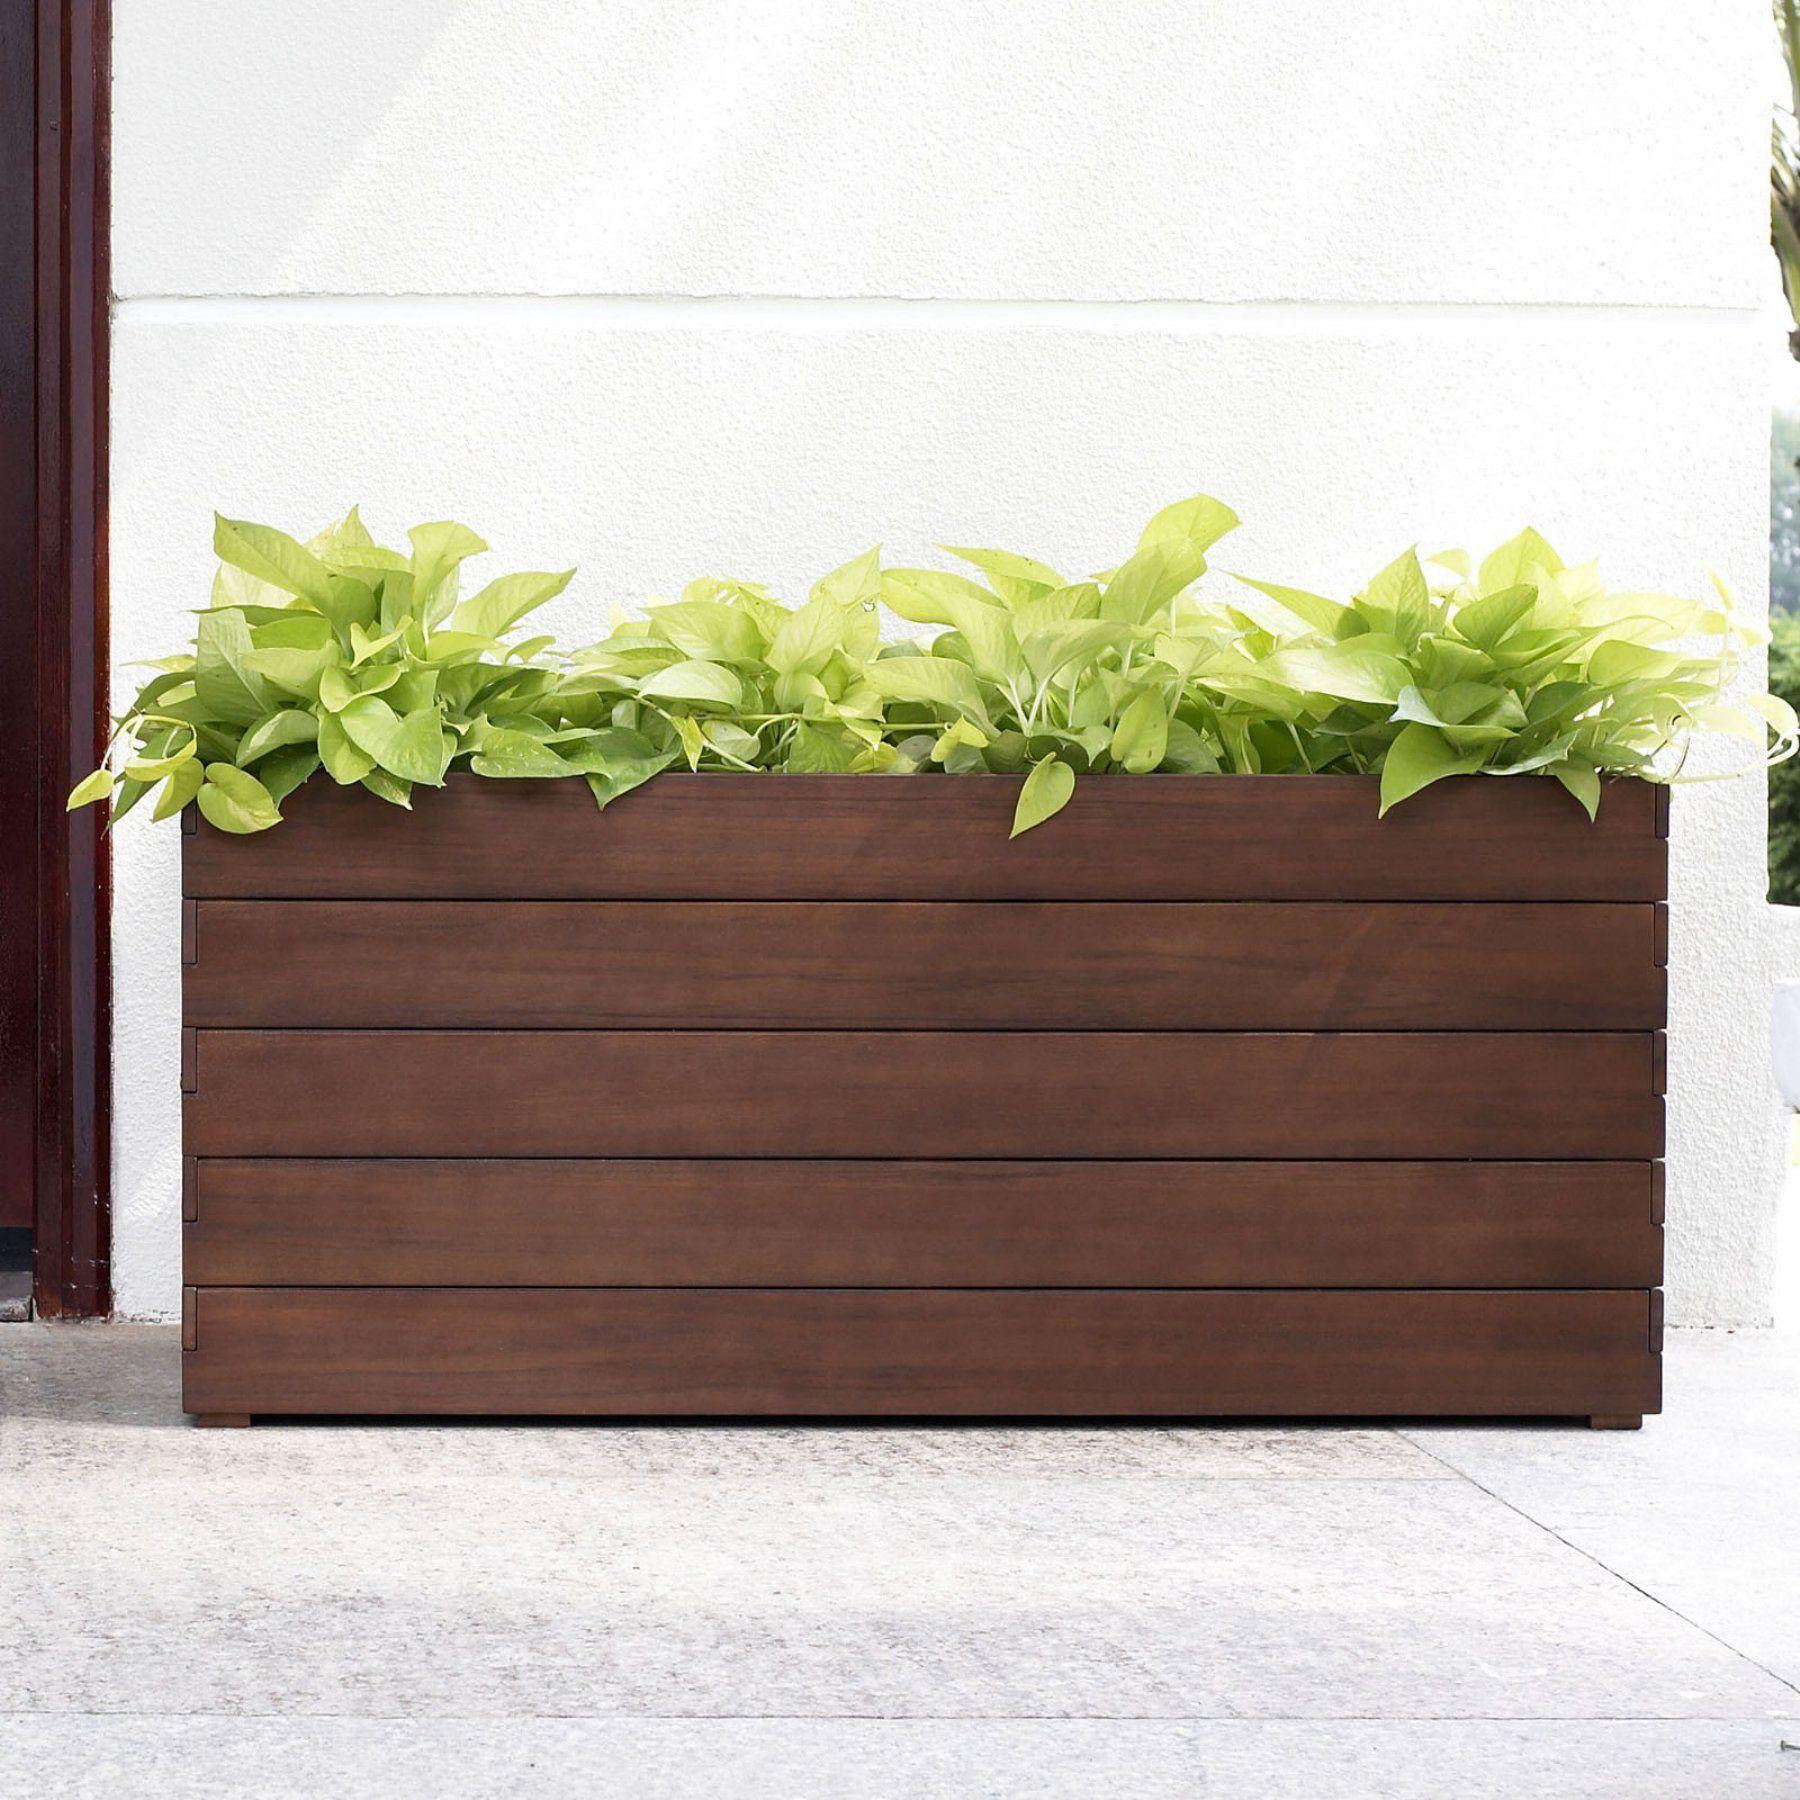 image garden plant street rectangle planters cadix trough greenhouses planter own pots low decor your grow rectangular